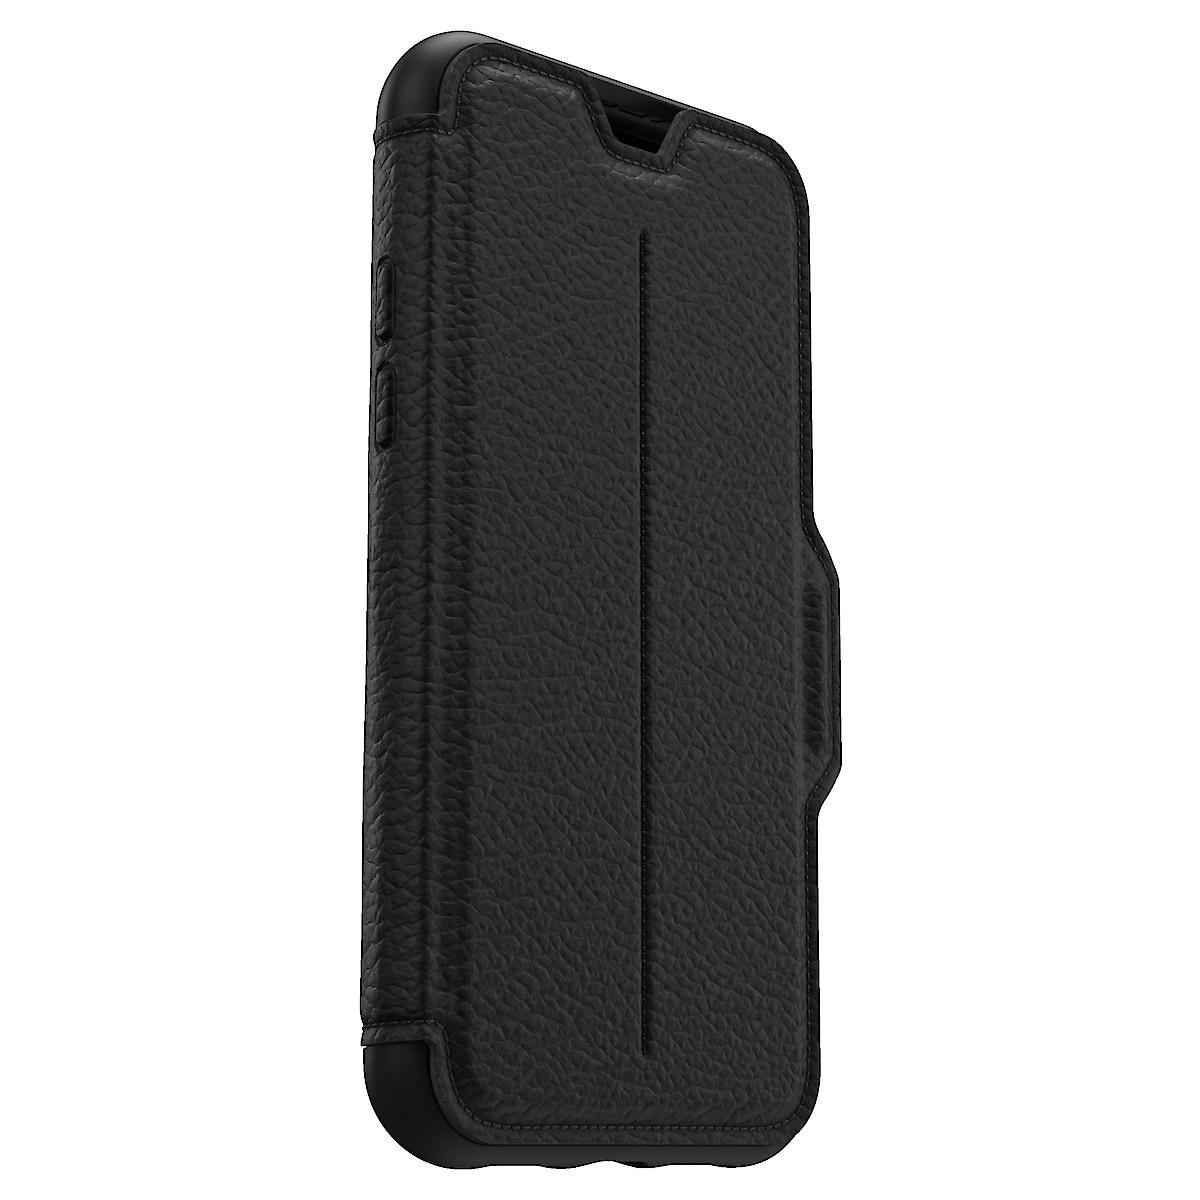 Otterbox Strada lommeboketui iPhone 11